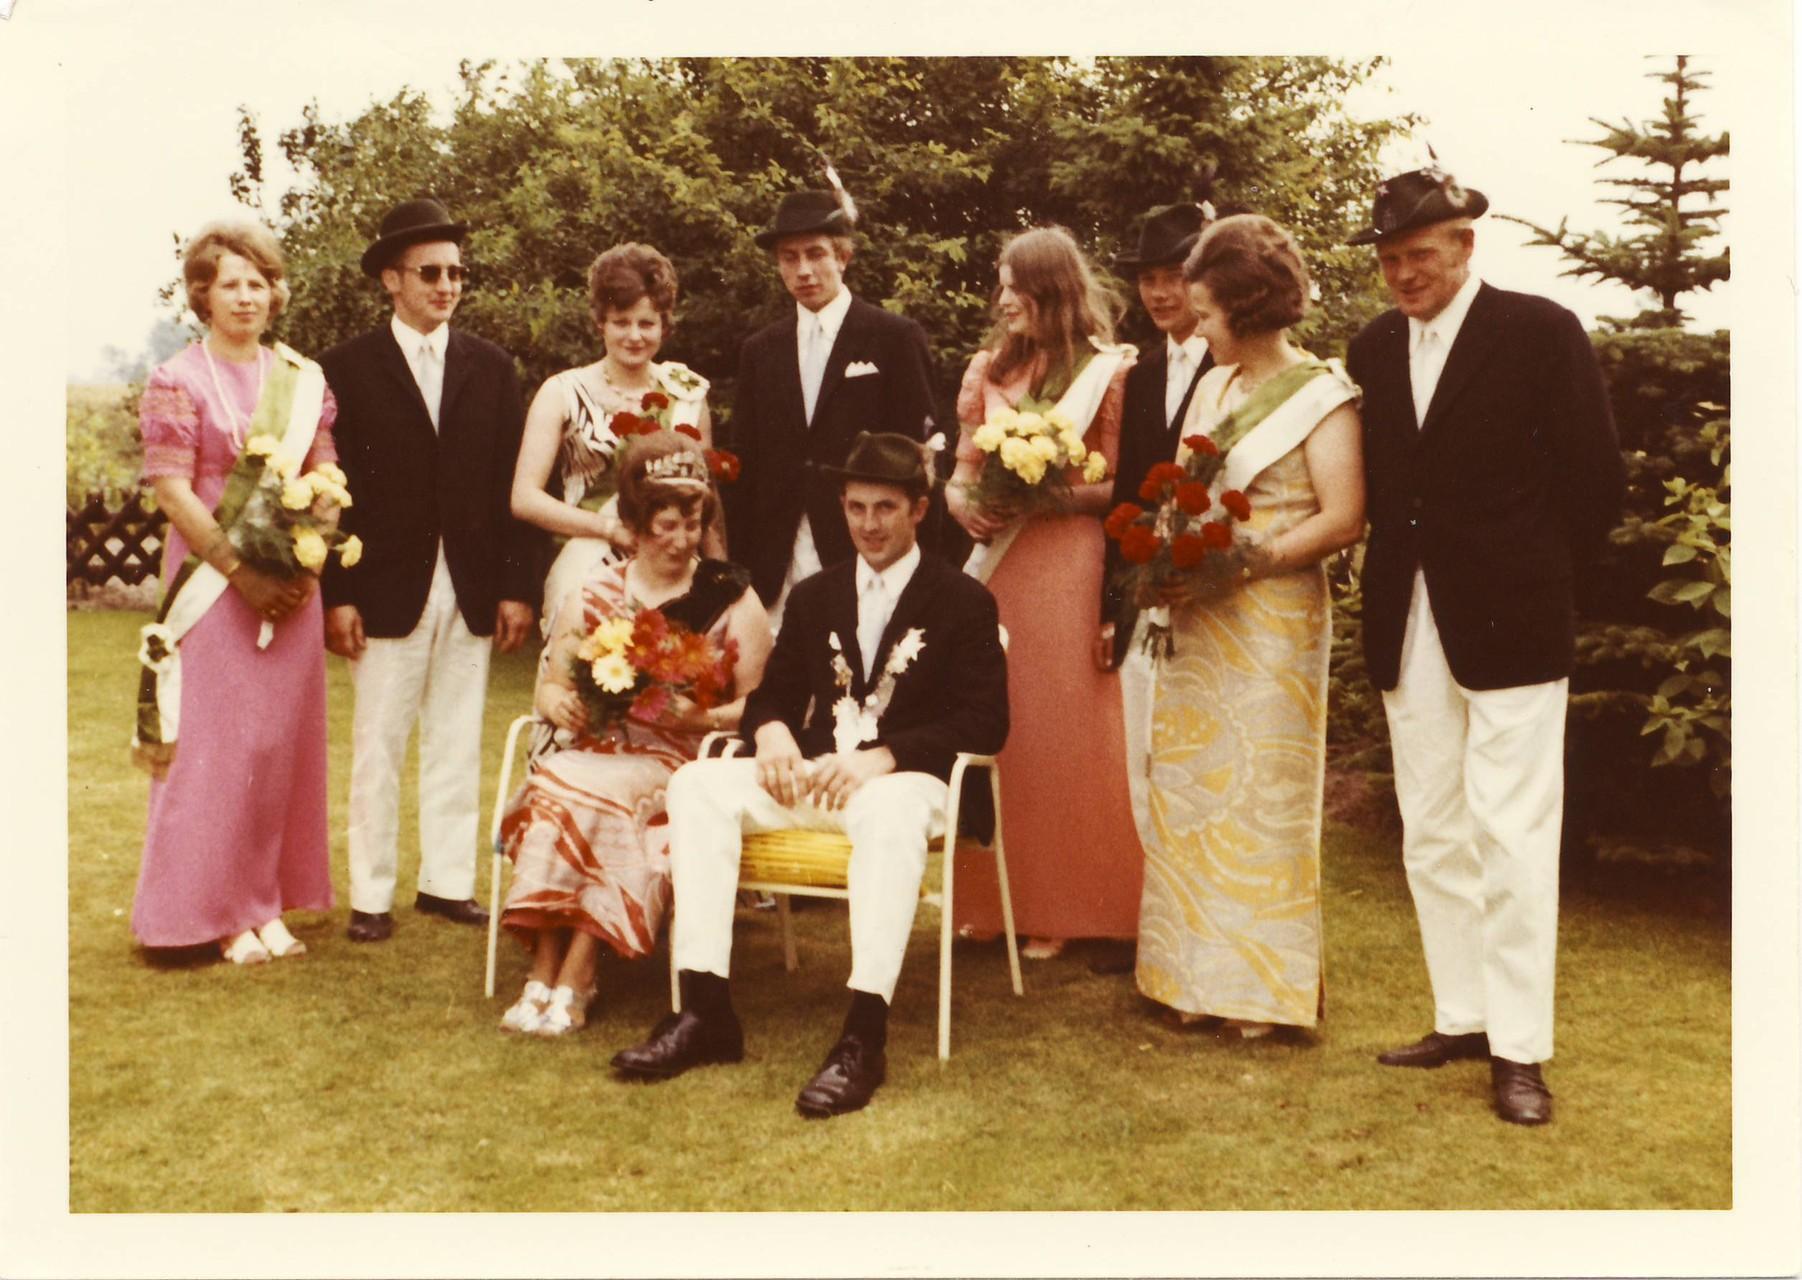 1971: König Helmut Pomberg und Königin Irmgard Hagemeyer